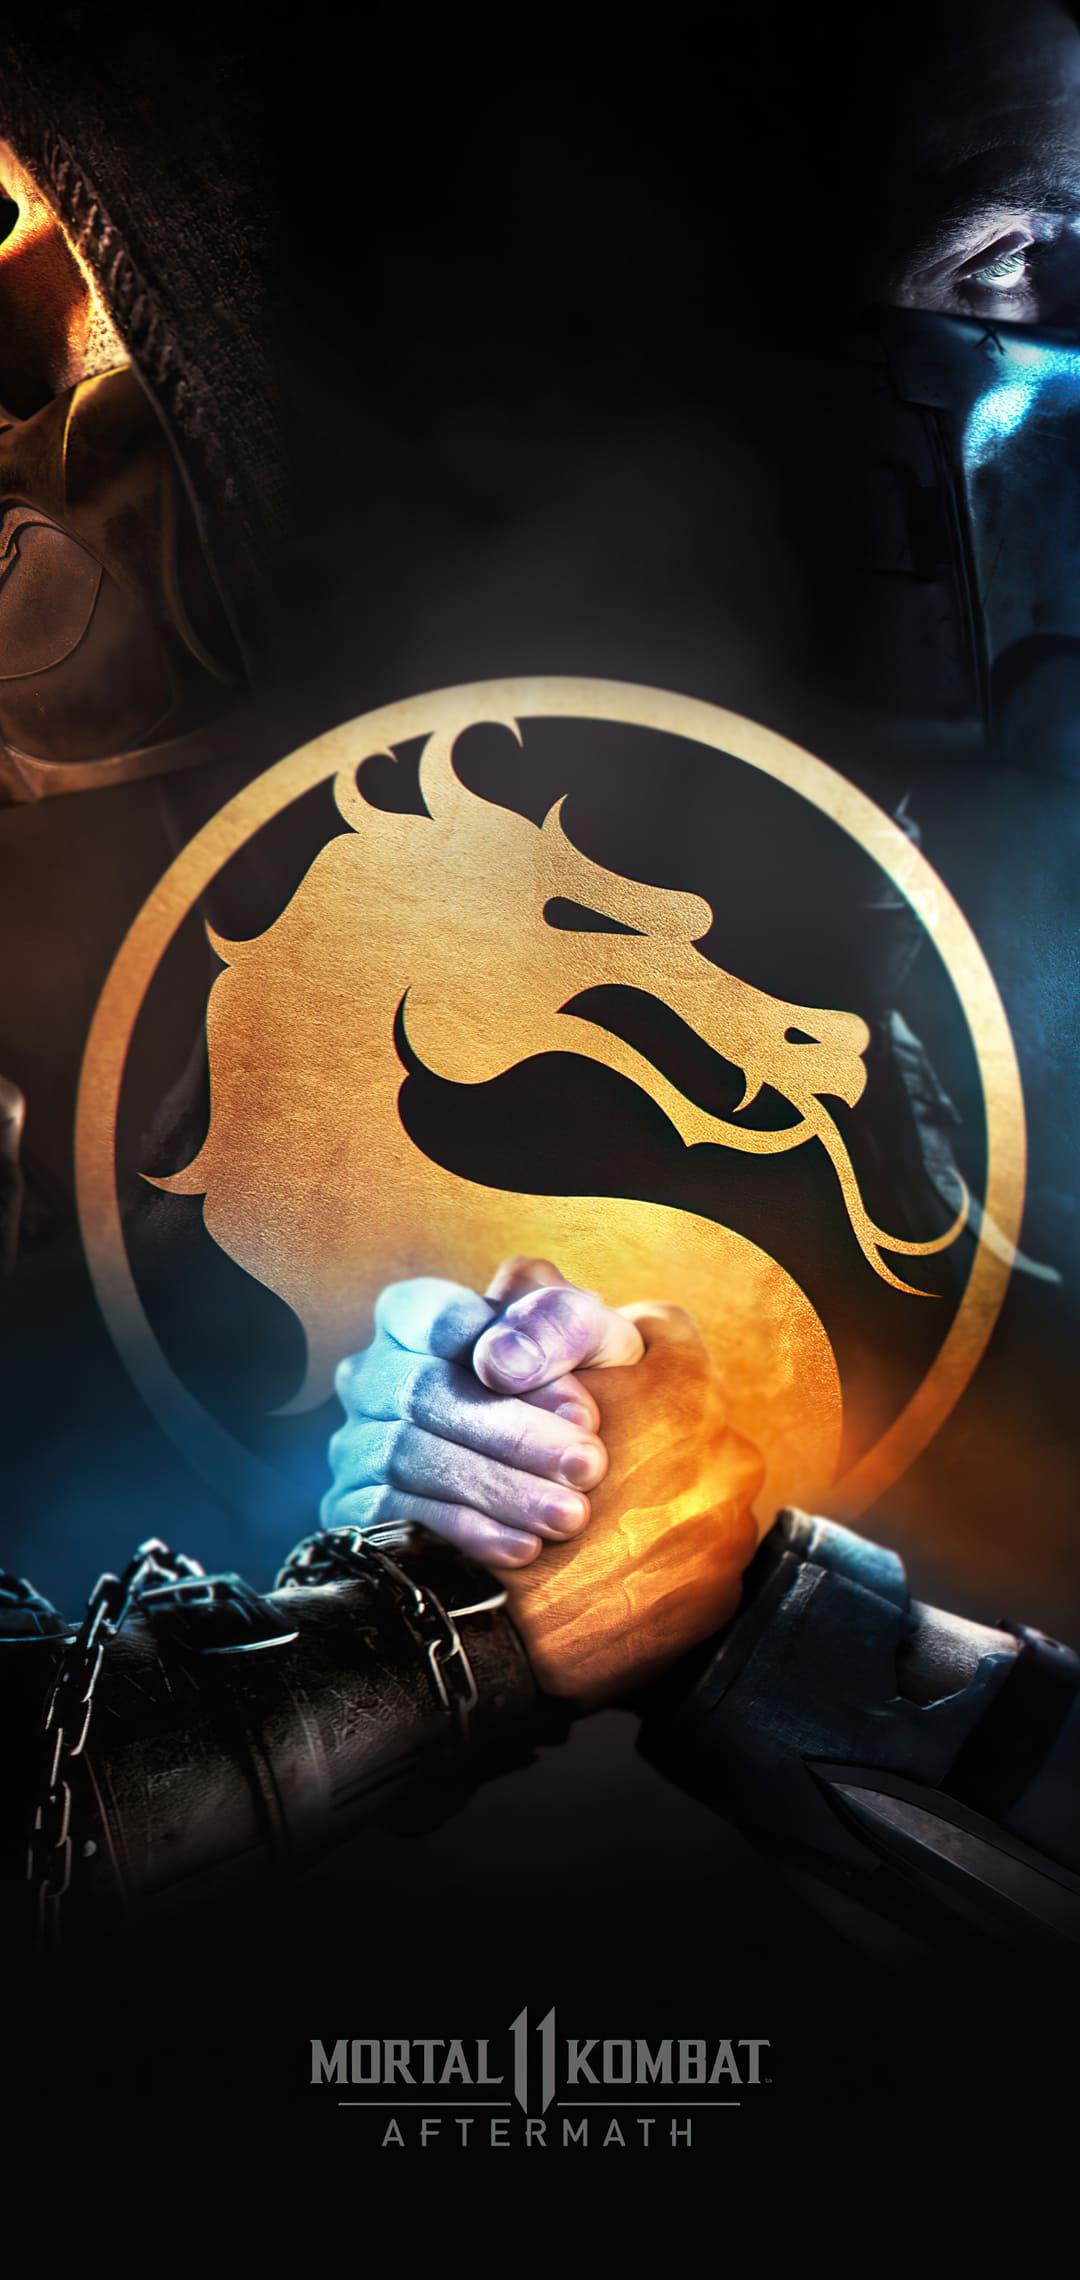 Cool Mortal Kombat Backgrounds